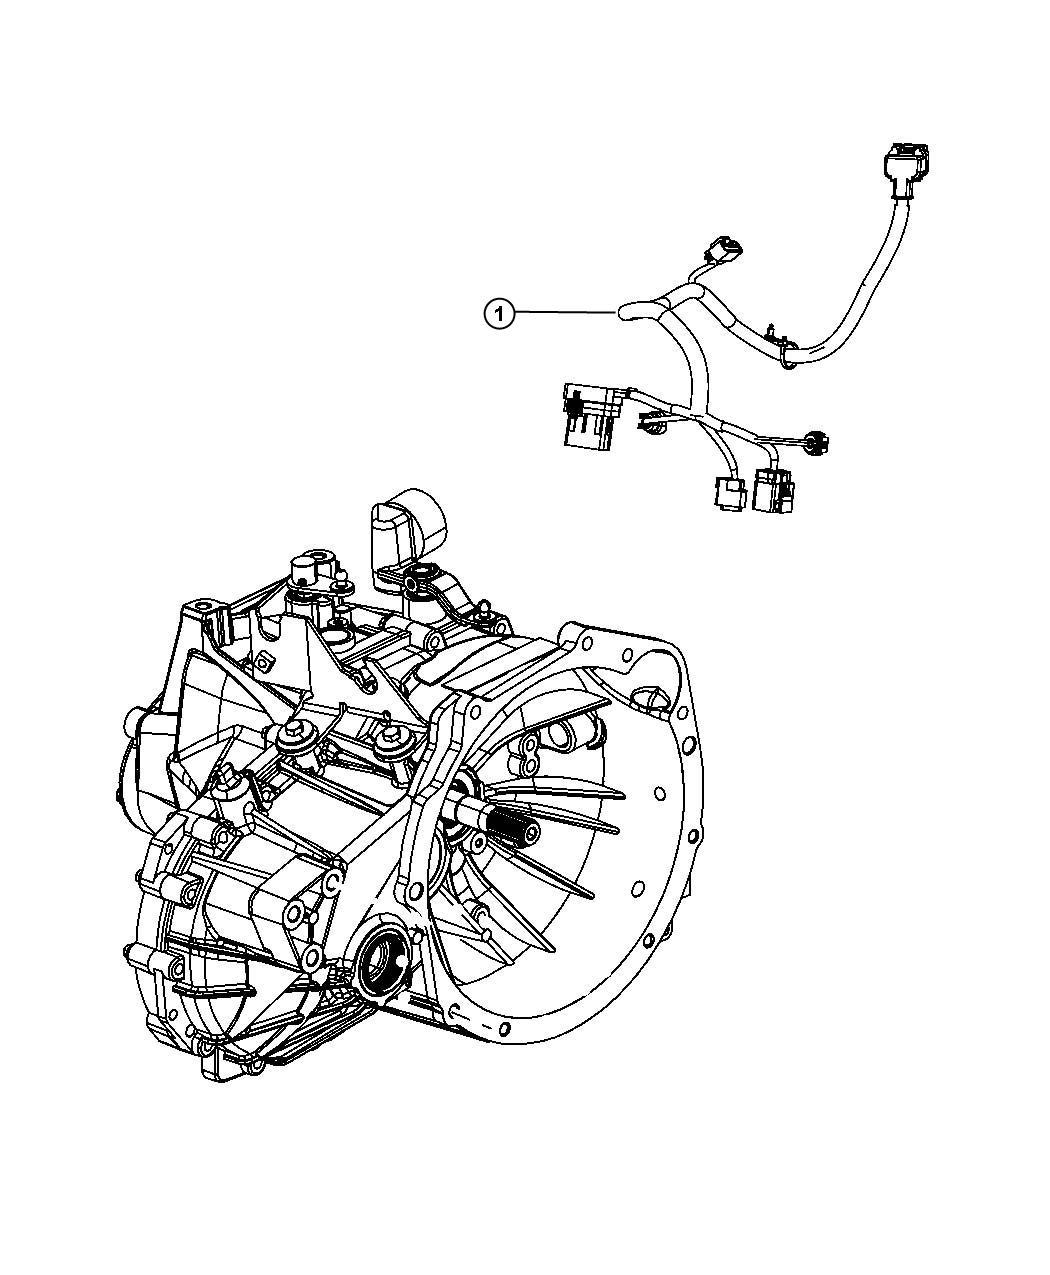 Diagram Chrysler 200 Wiring Diagram Full Version Hd